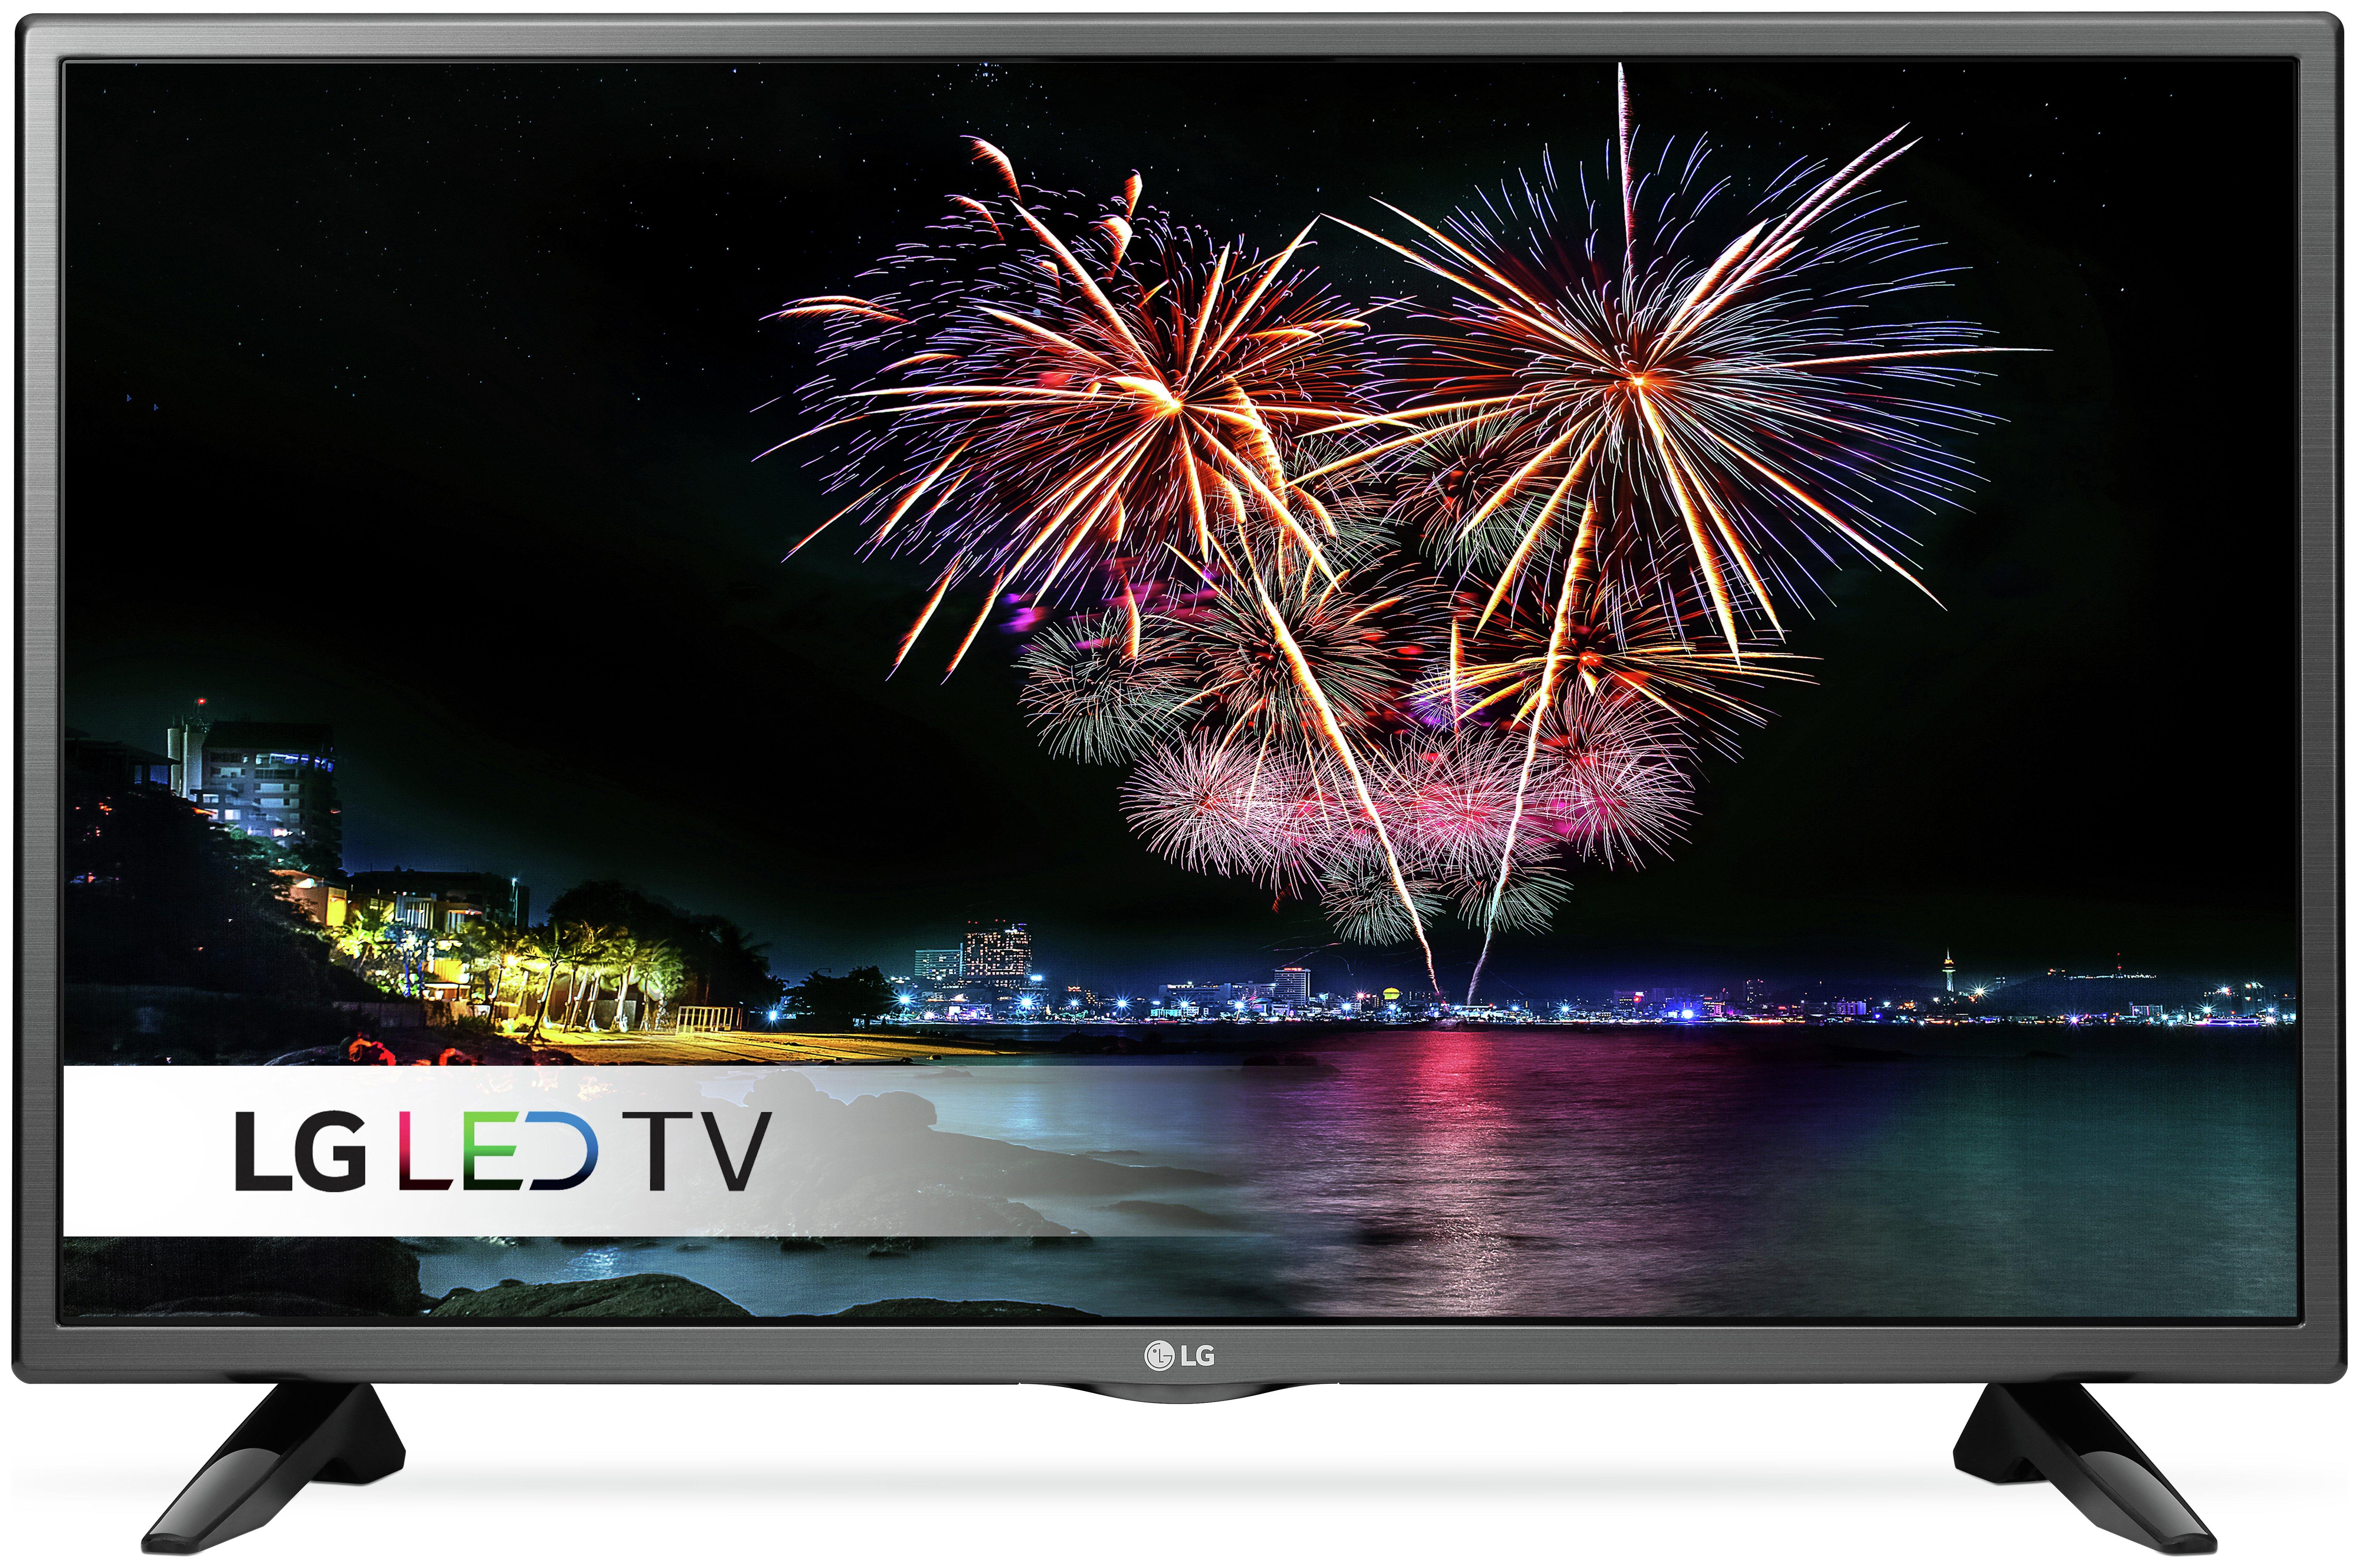 LG LG 32LH510U 32 Inch LED Freeview HD TV.